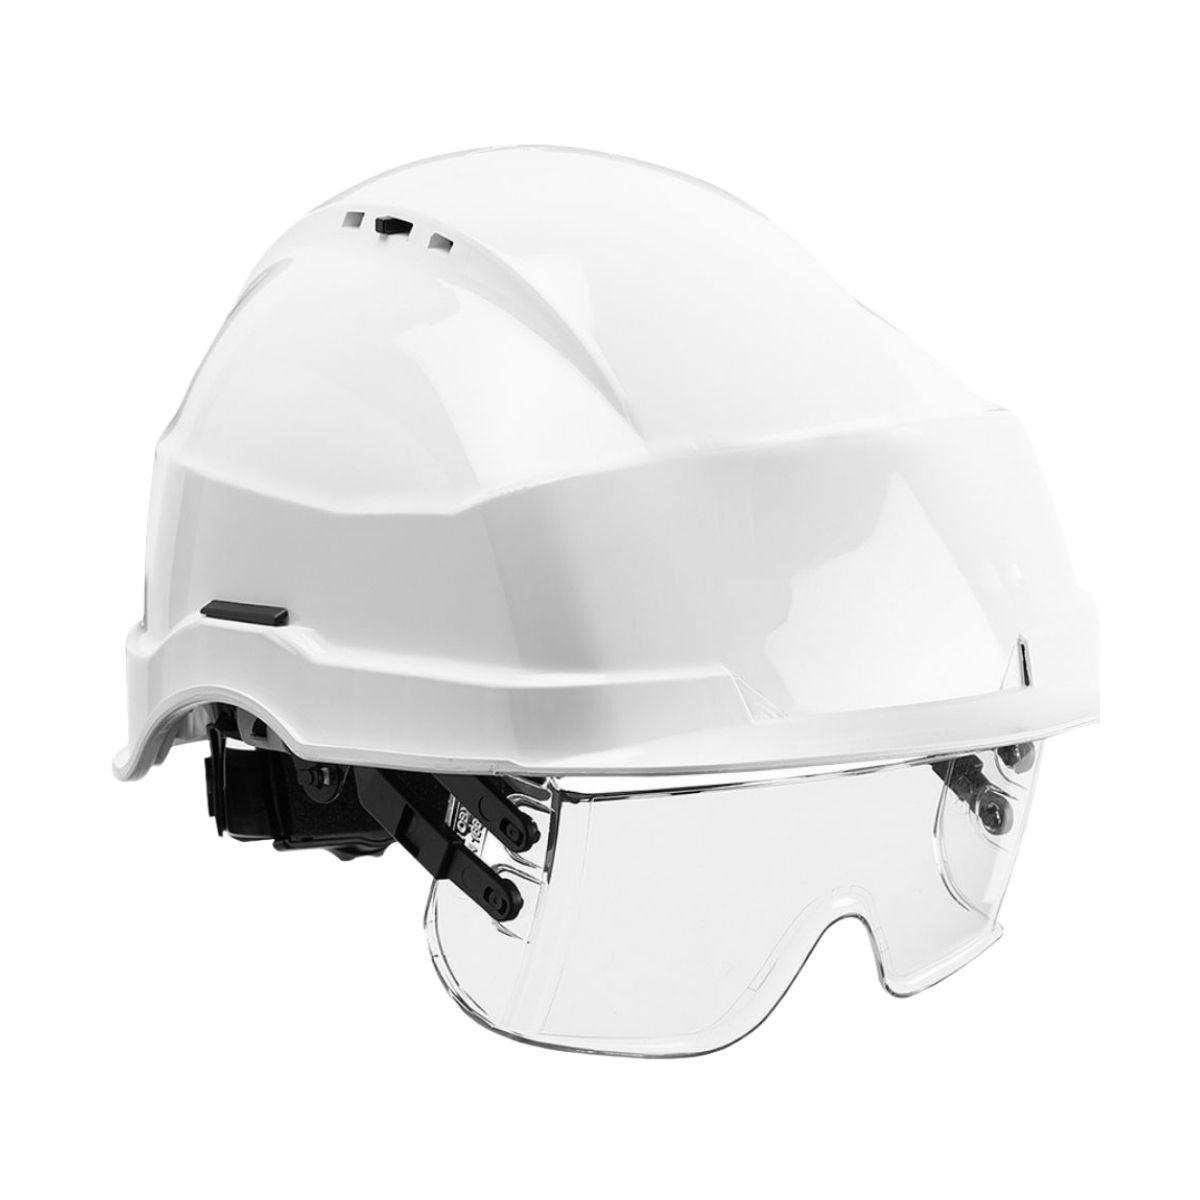 HF0510 Iris II Safety Visor and Helmet